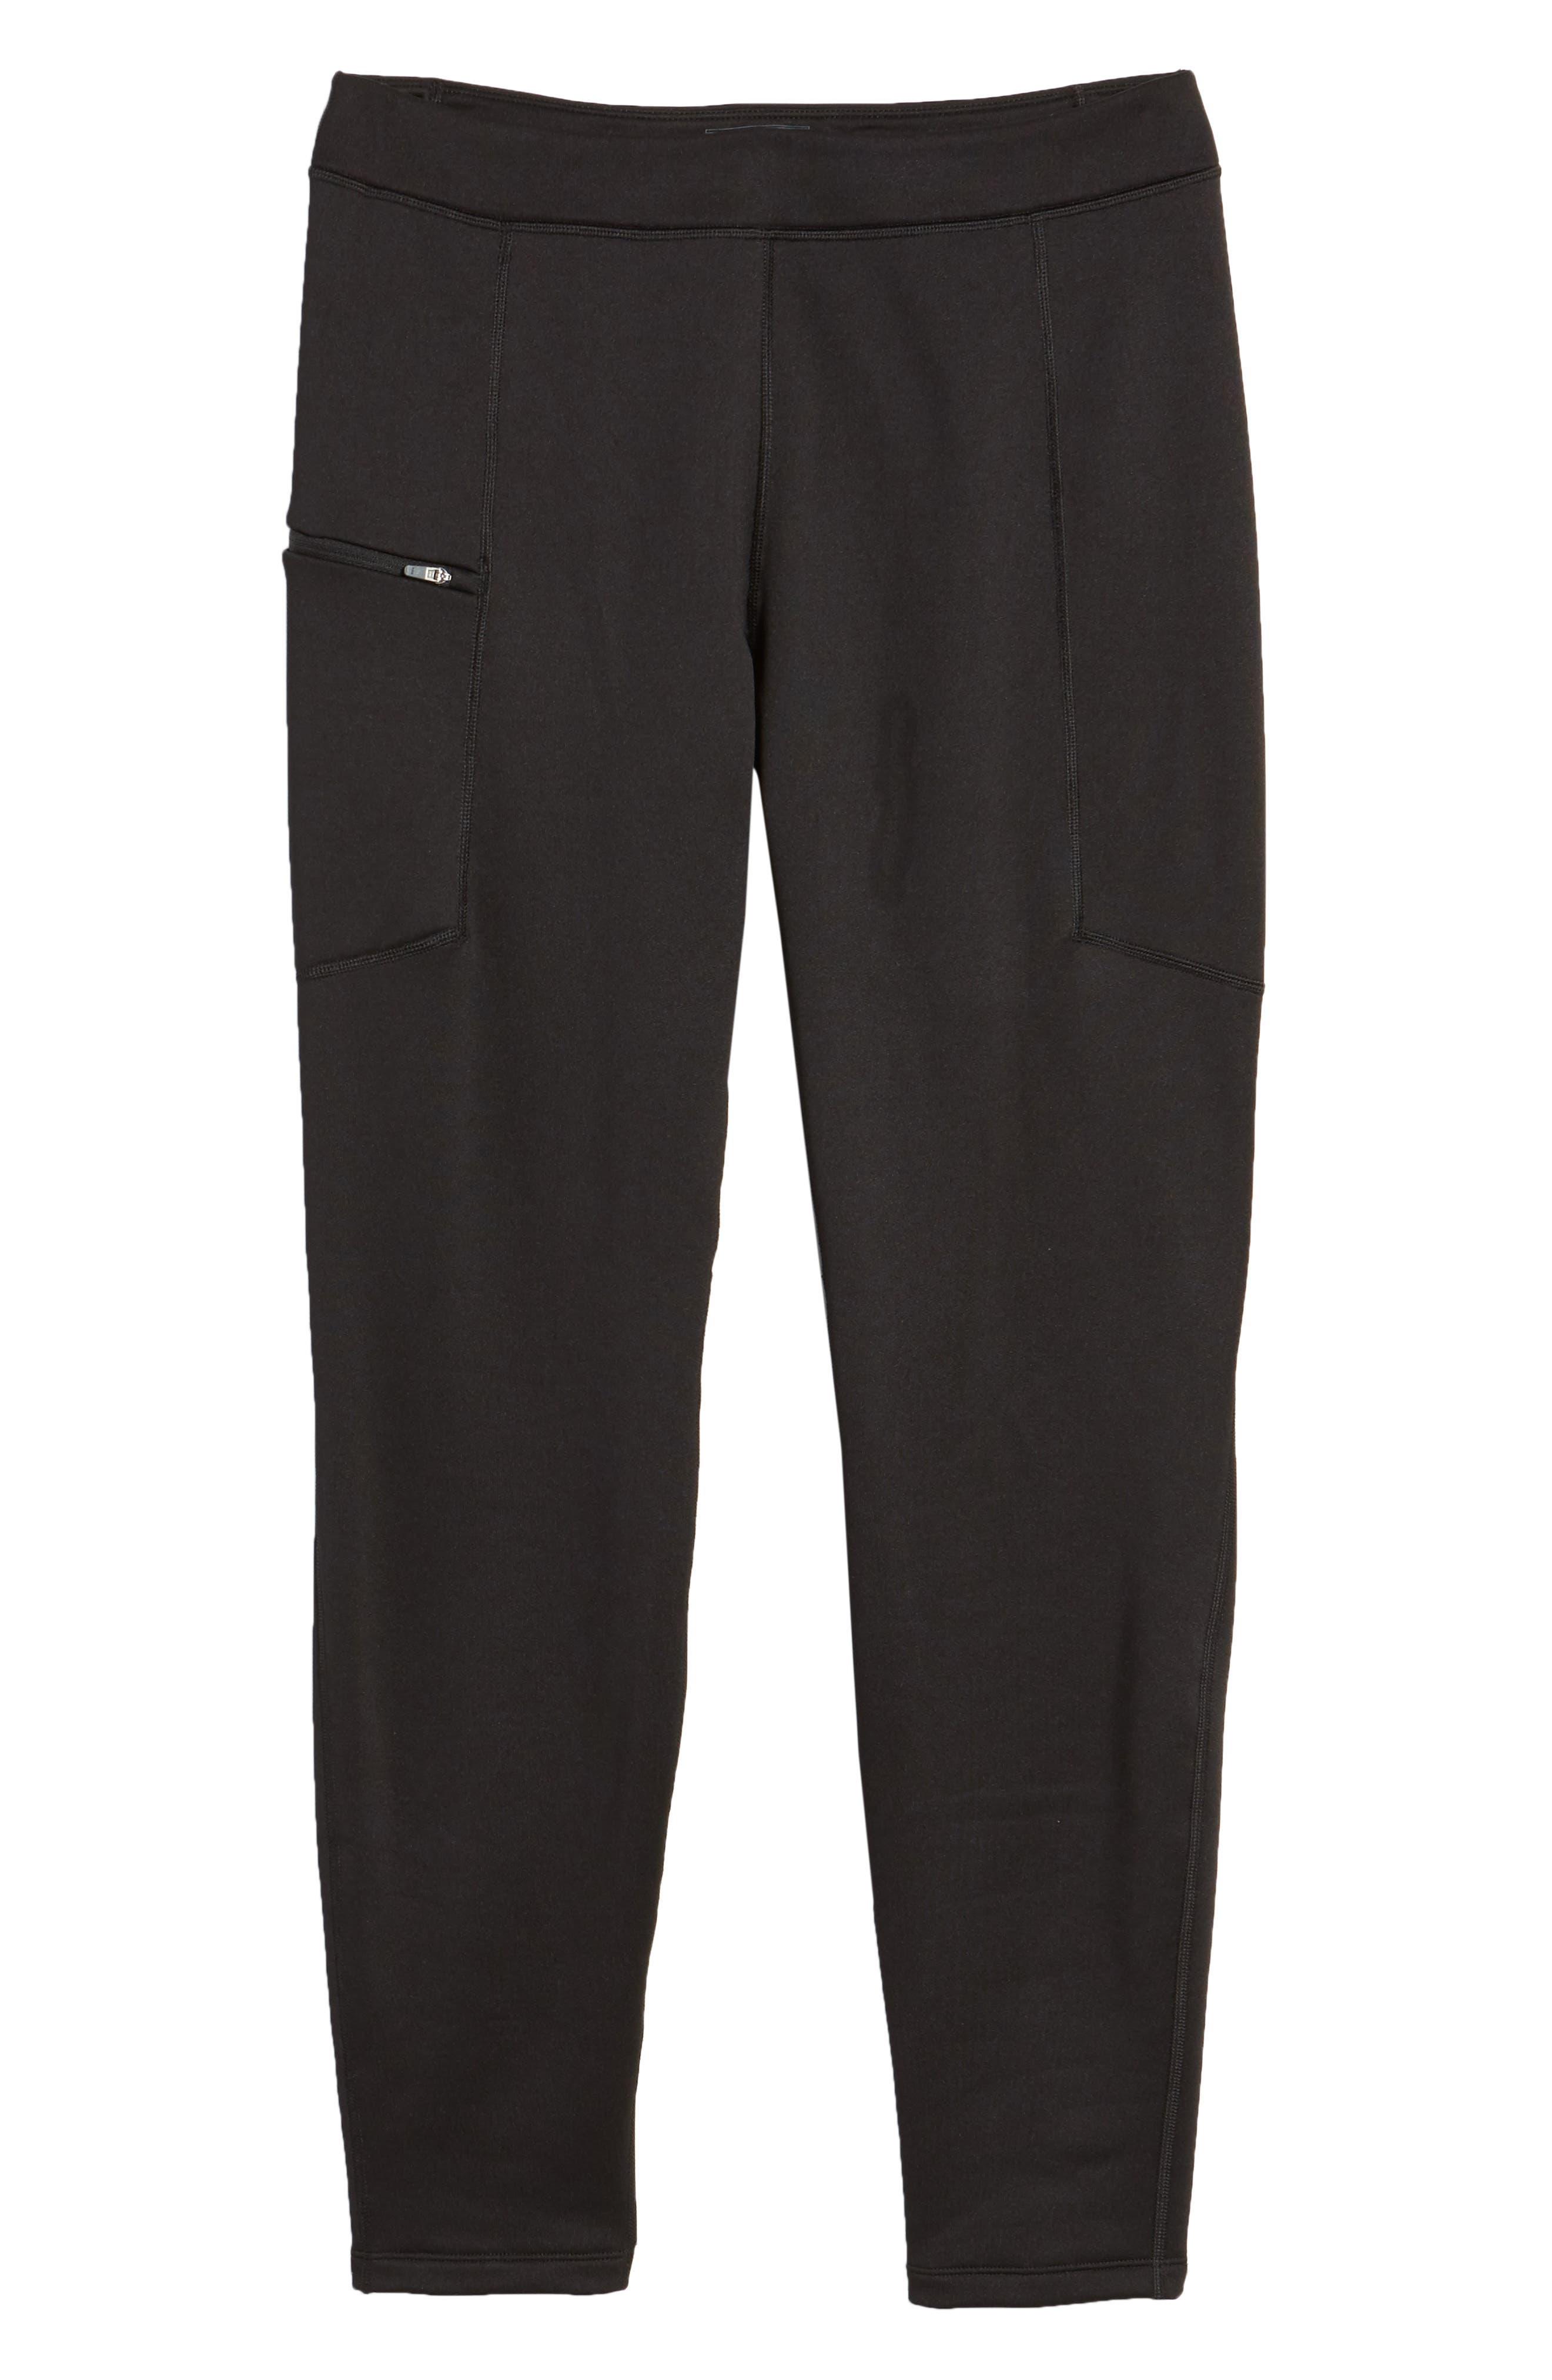 Crosstrek Pants,                             Alternate thumbnail 6, color,                             Black